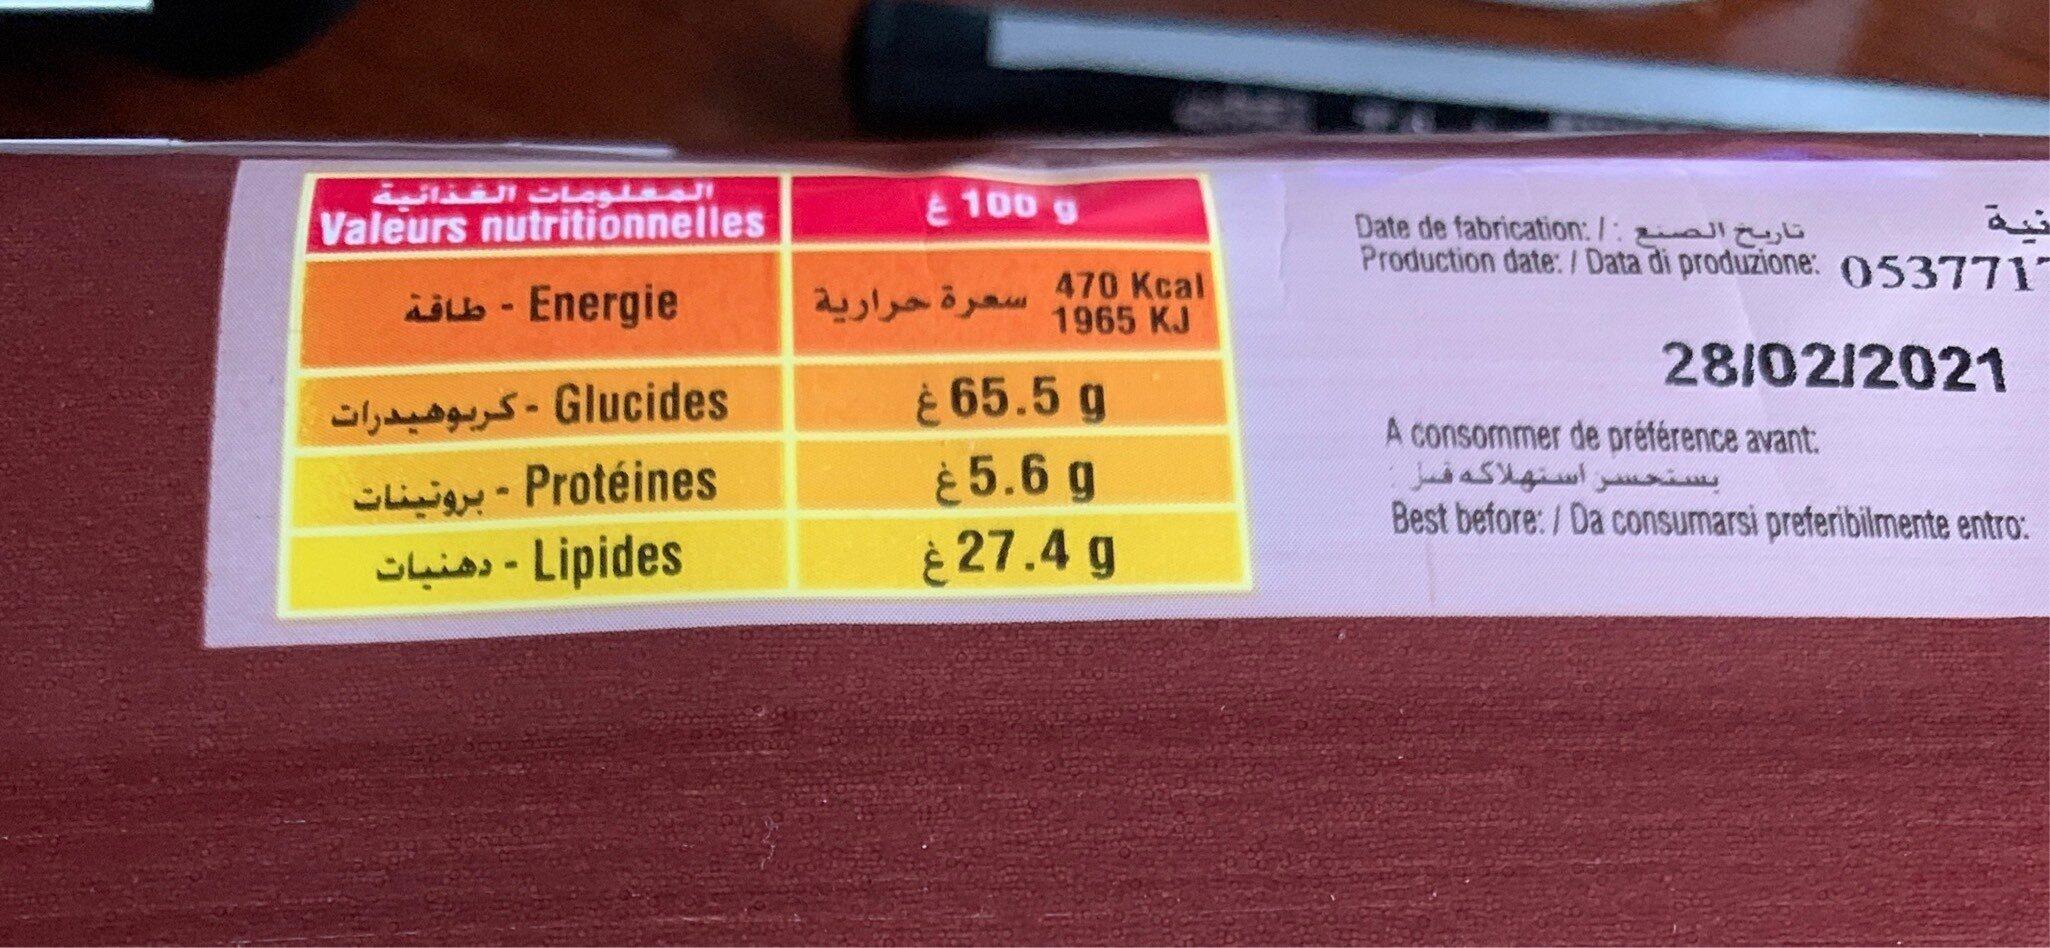 Biscuits Tartelettes Au Chocolat Saida (120G) - Nutrition facts - fr